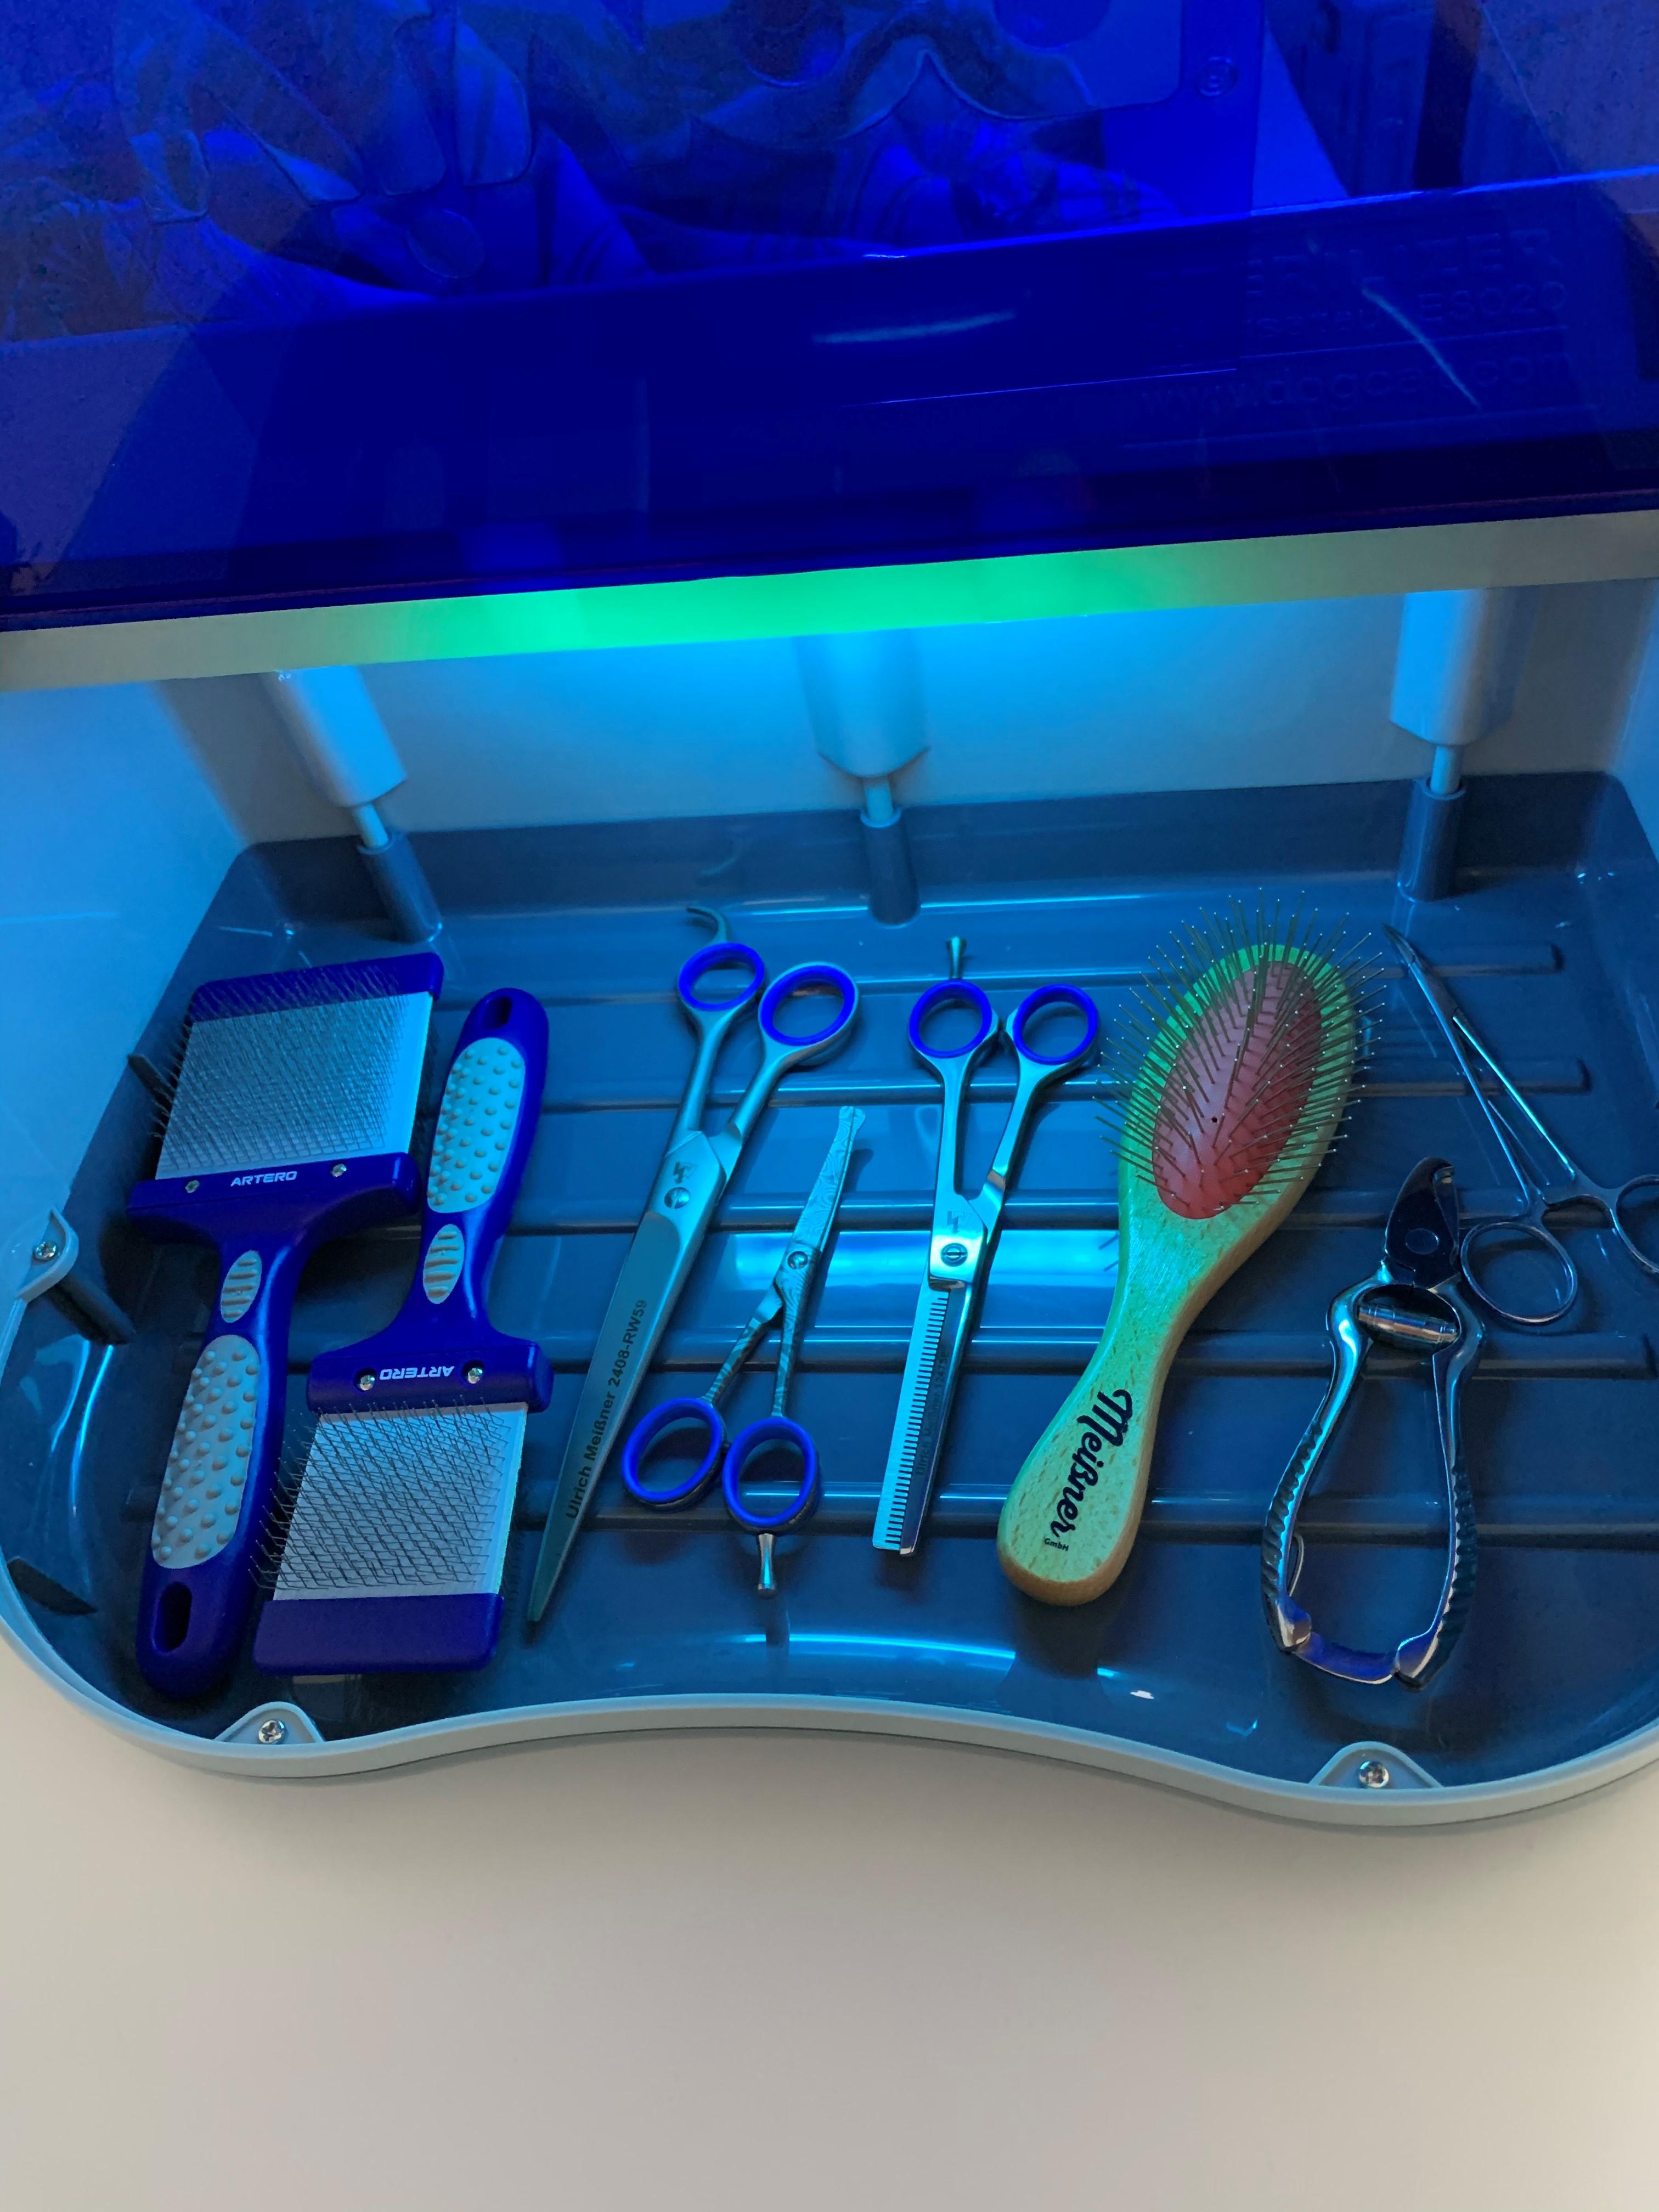 Weiss Sooiy UV-Sterilisator Heizung Handt/ücher 2 in 1 Barber Esthetique Spa Nagel-Trockner und Lampen Sterilisatoren